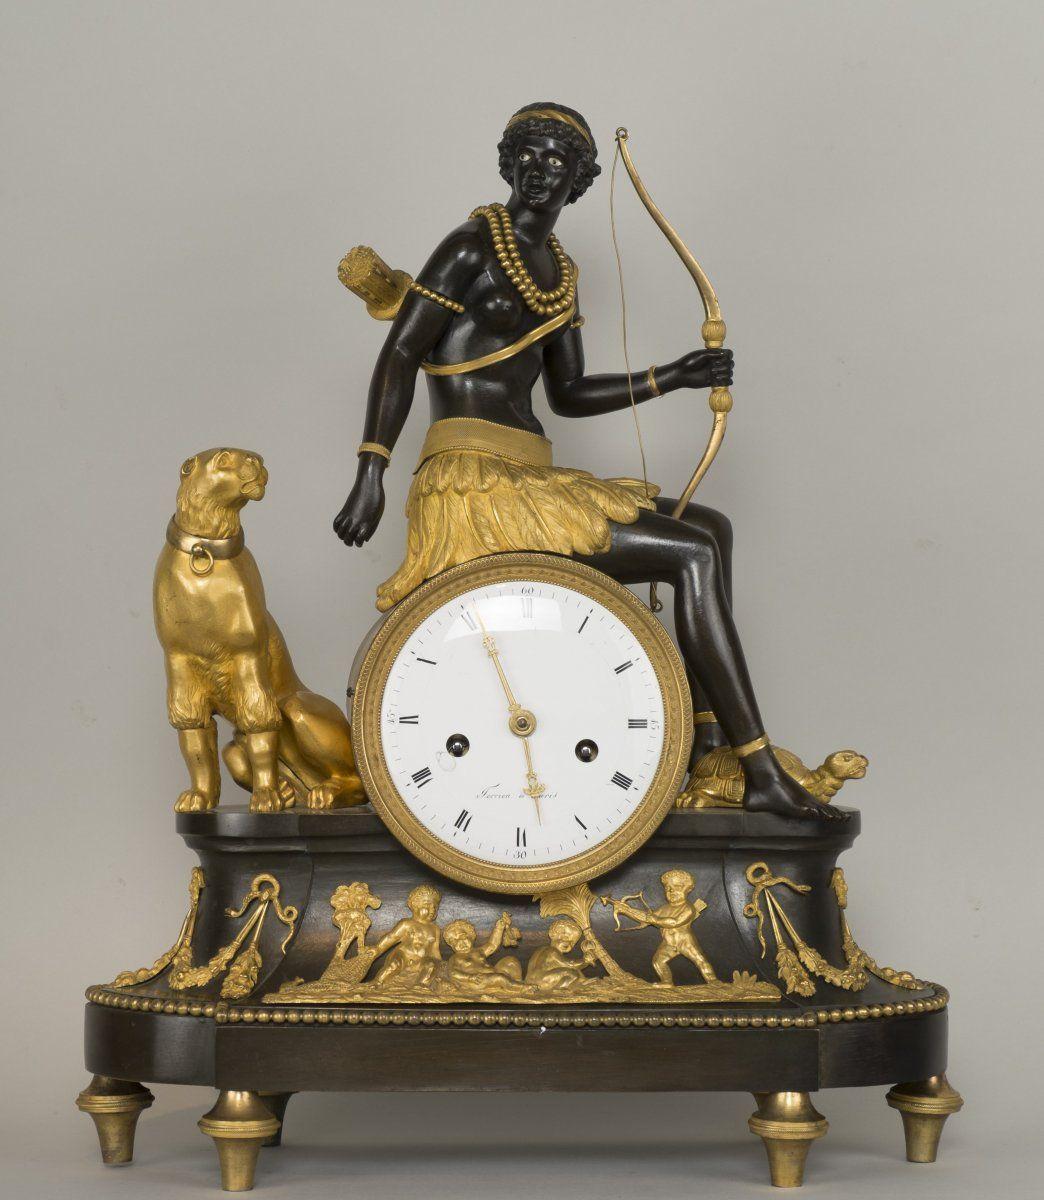 Circa 1800 Clock Depicting Africa